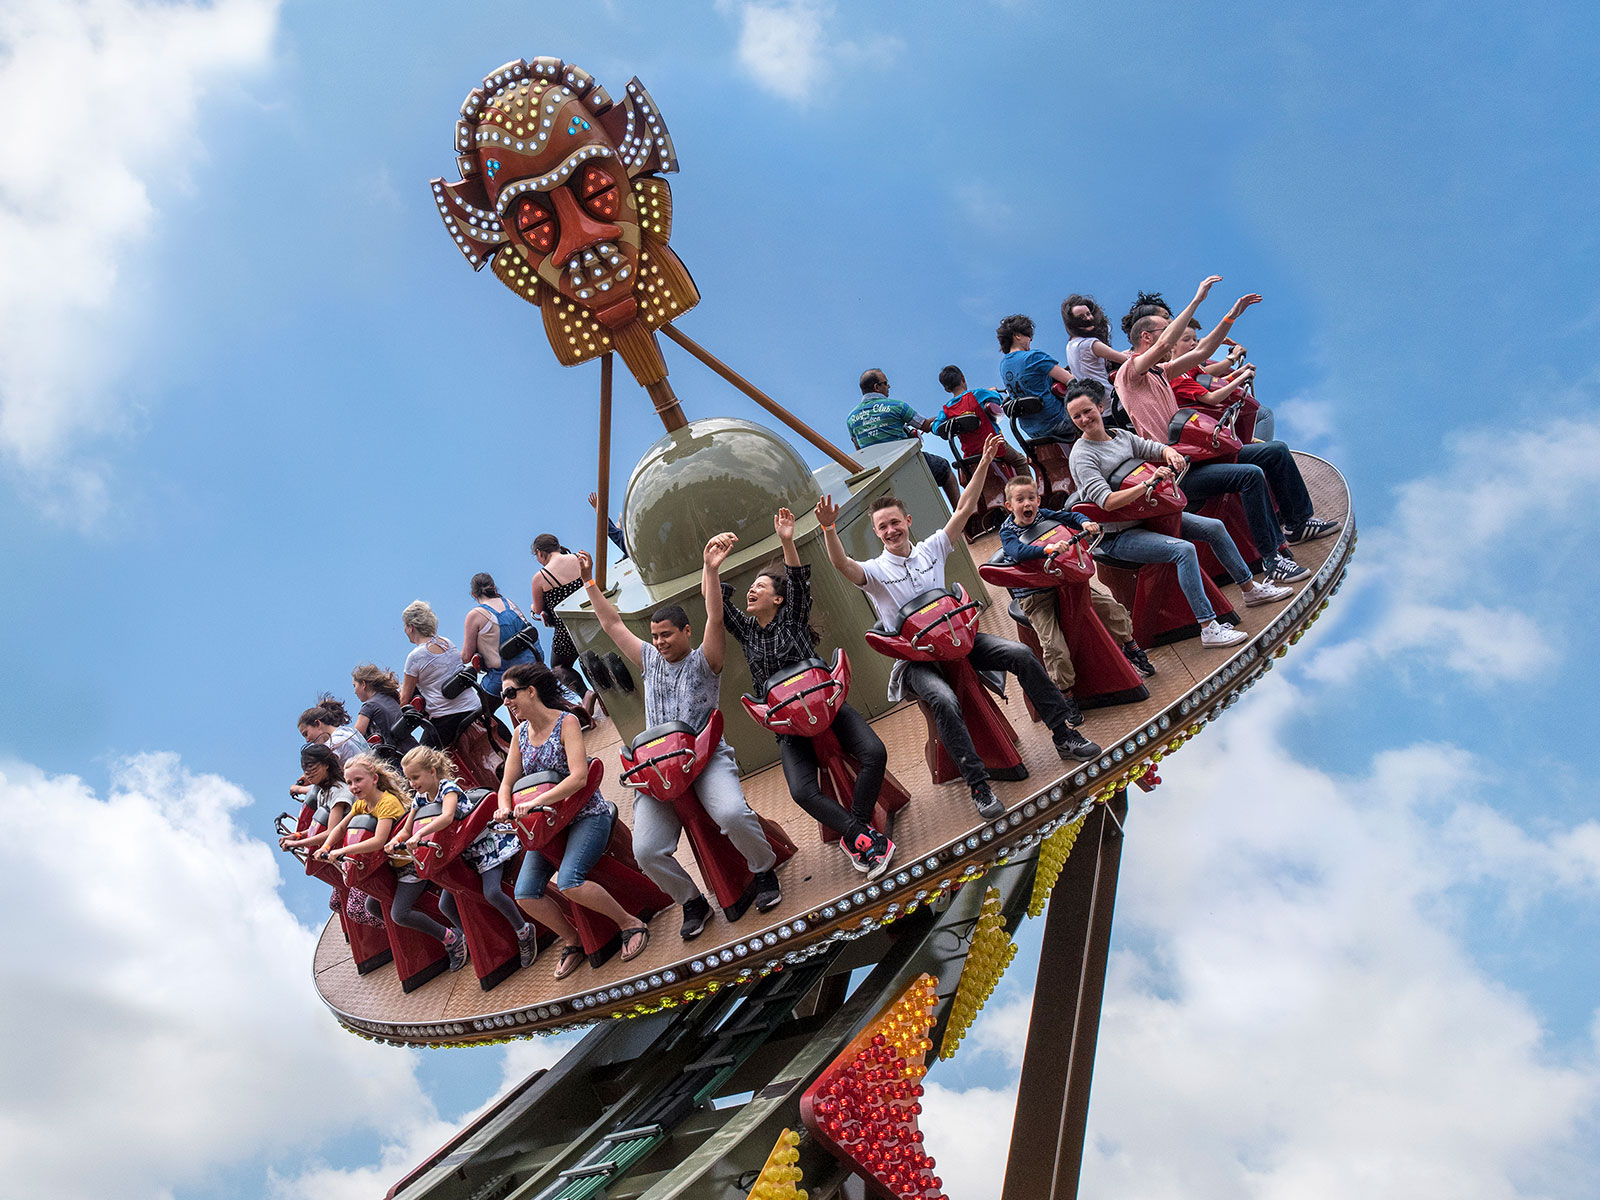 Adventure Theme Park - West Midland Safari & Leisure Park